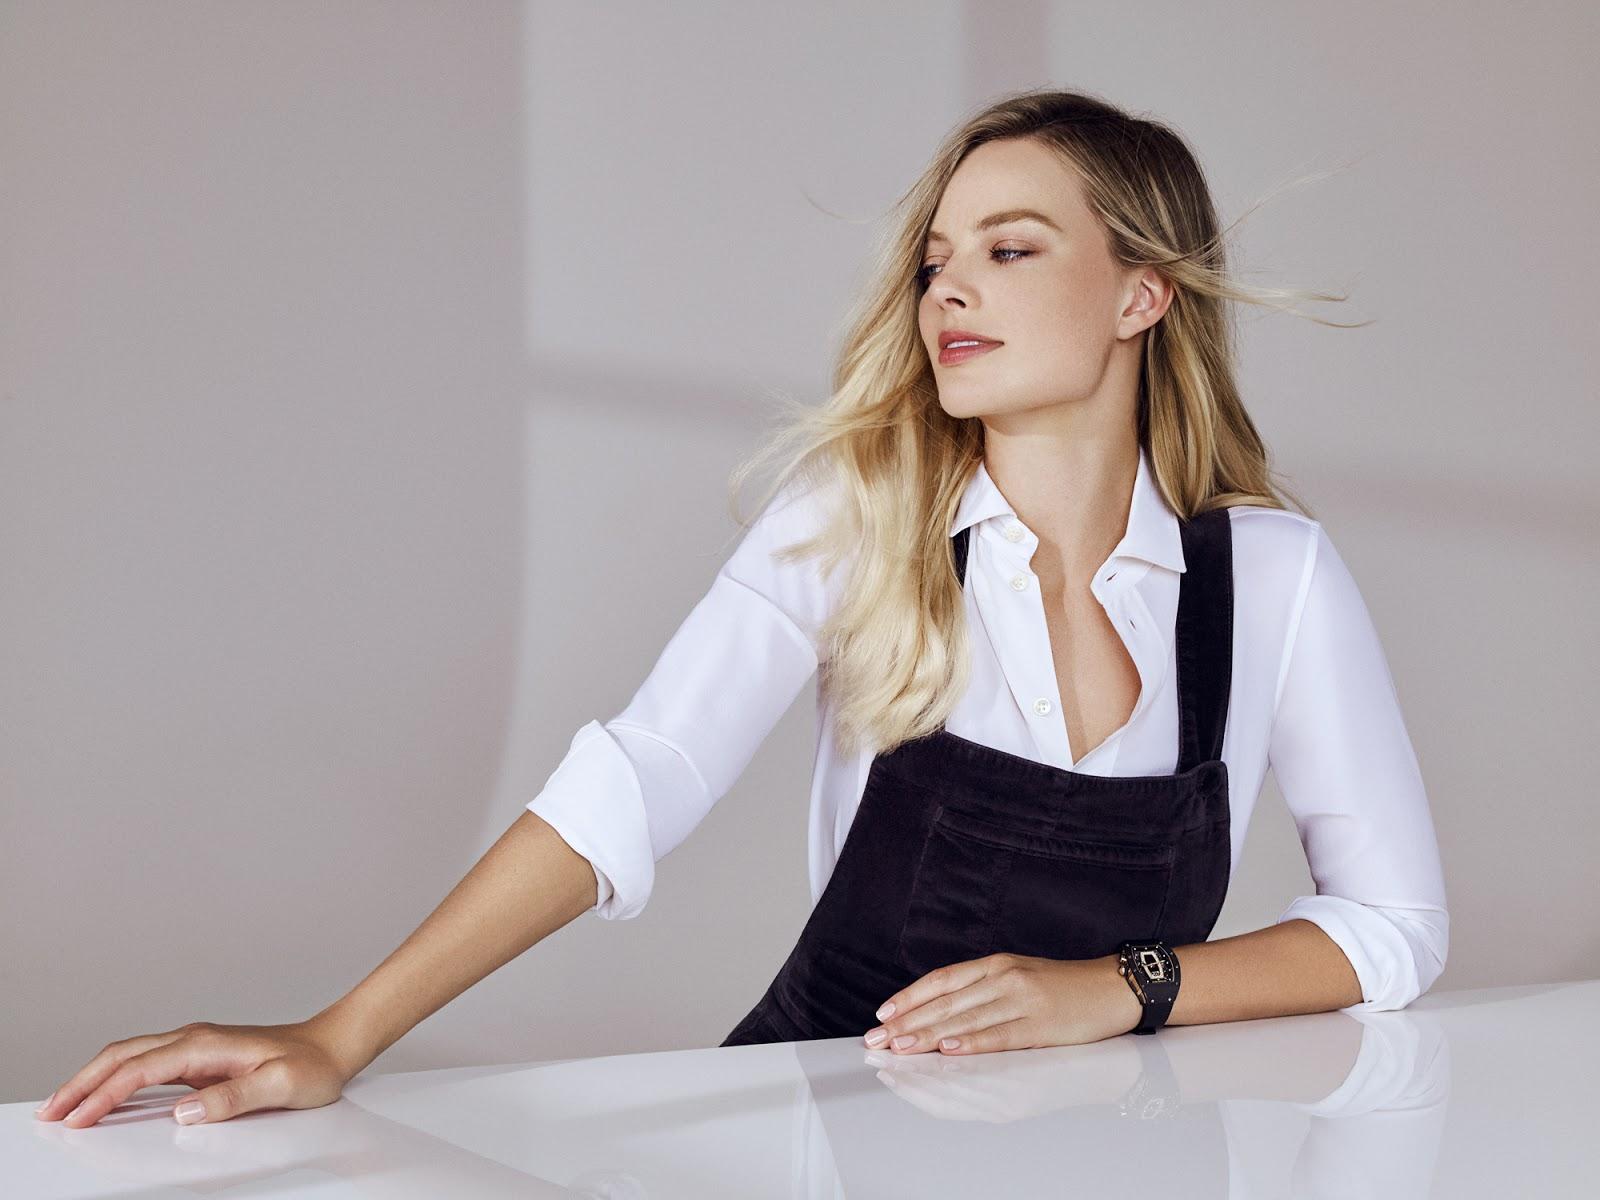 Margot Robbie Wiki, Height, Age, Boyfriend, Family, Biography